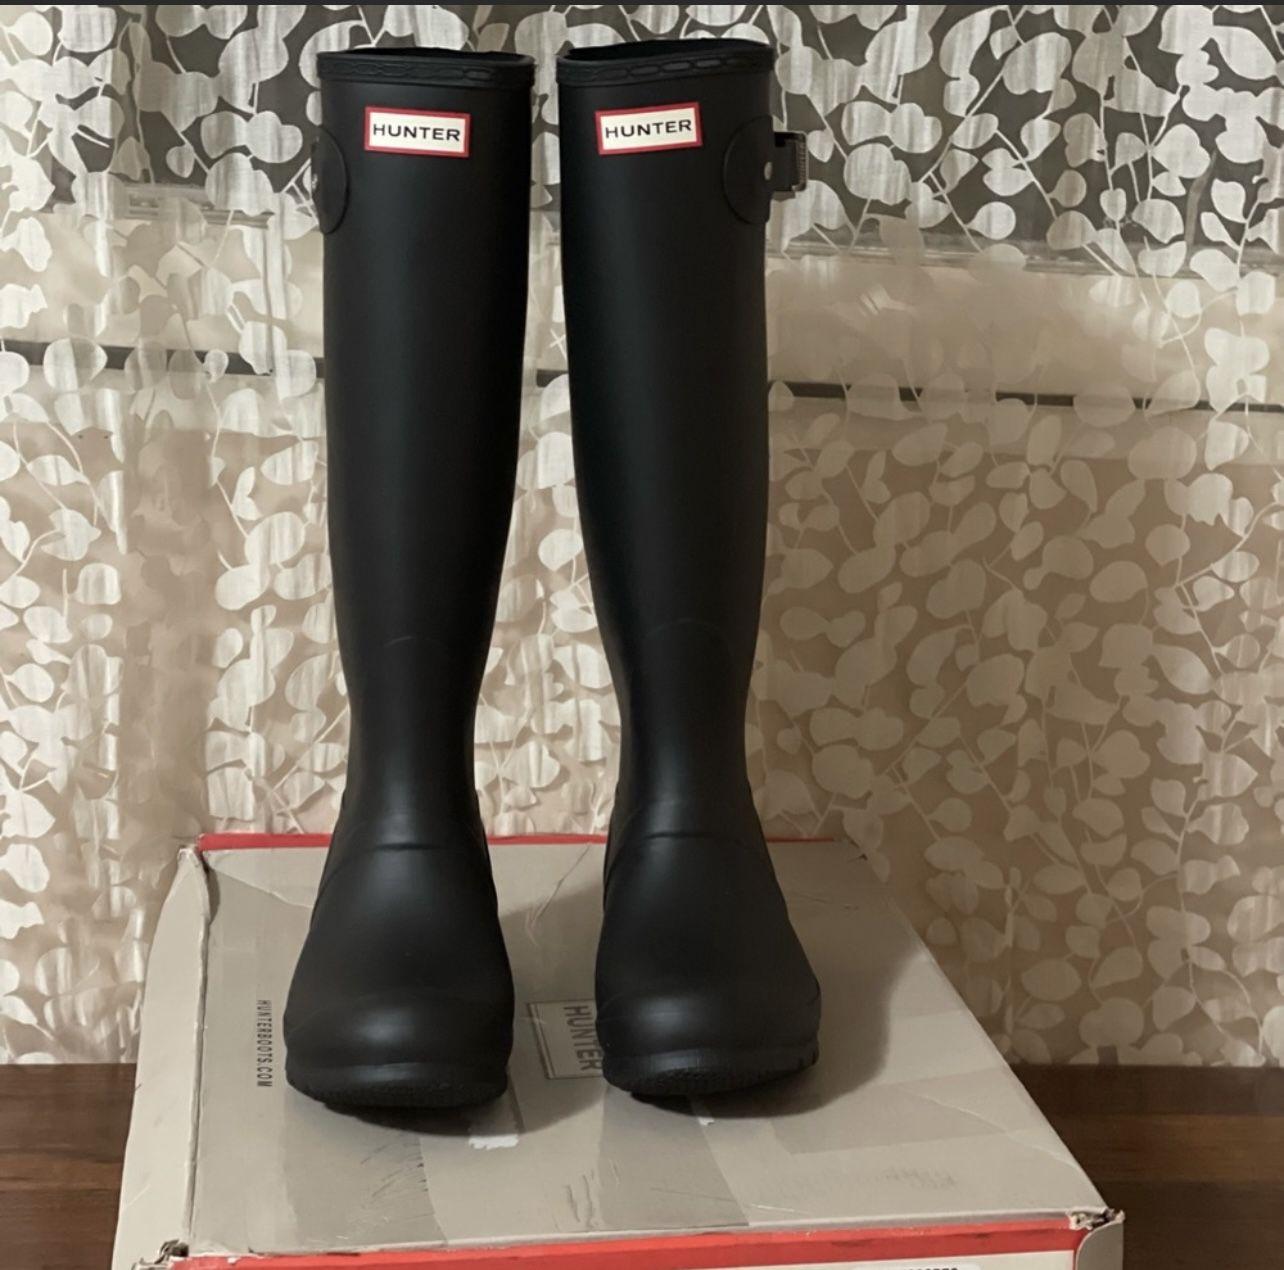 Hunter Classic tall Knee High Rain boots new